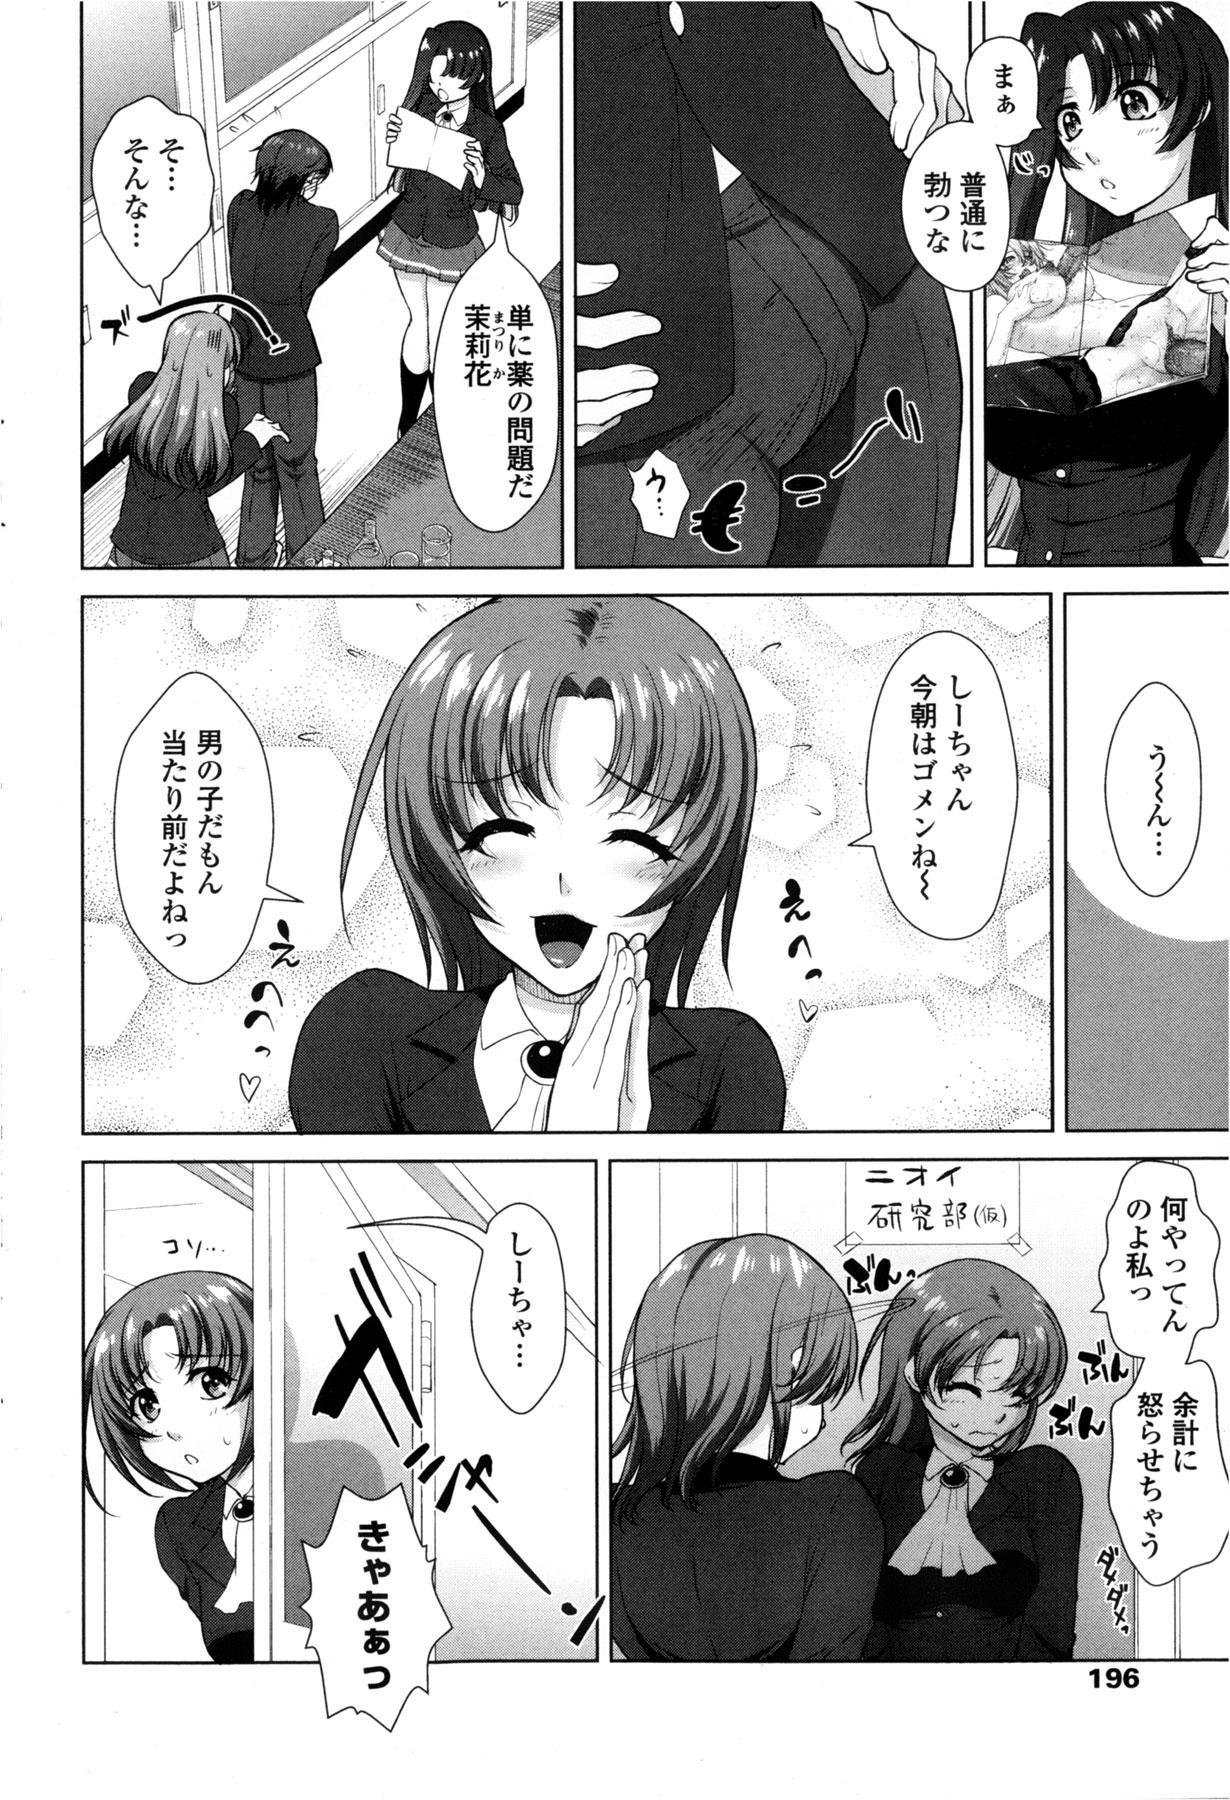 COMIC Penguin Club Sanzokuban 2013-02 197